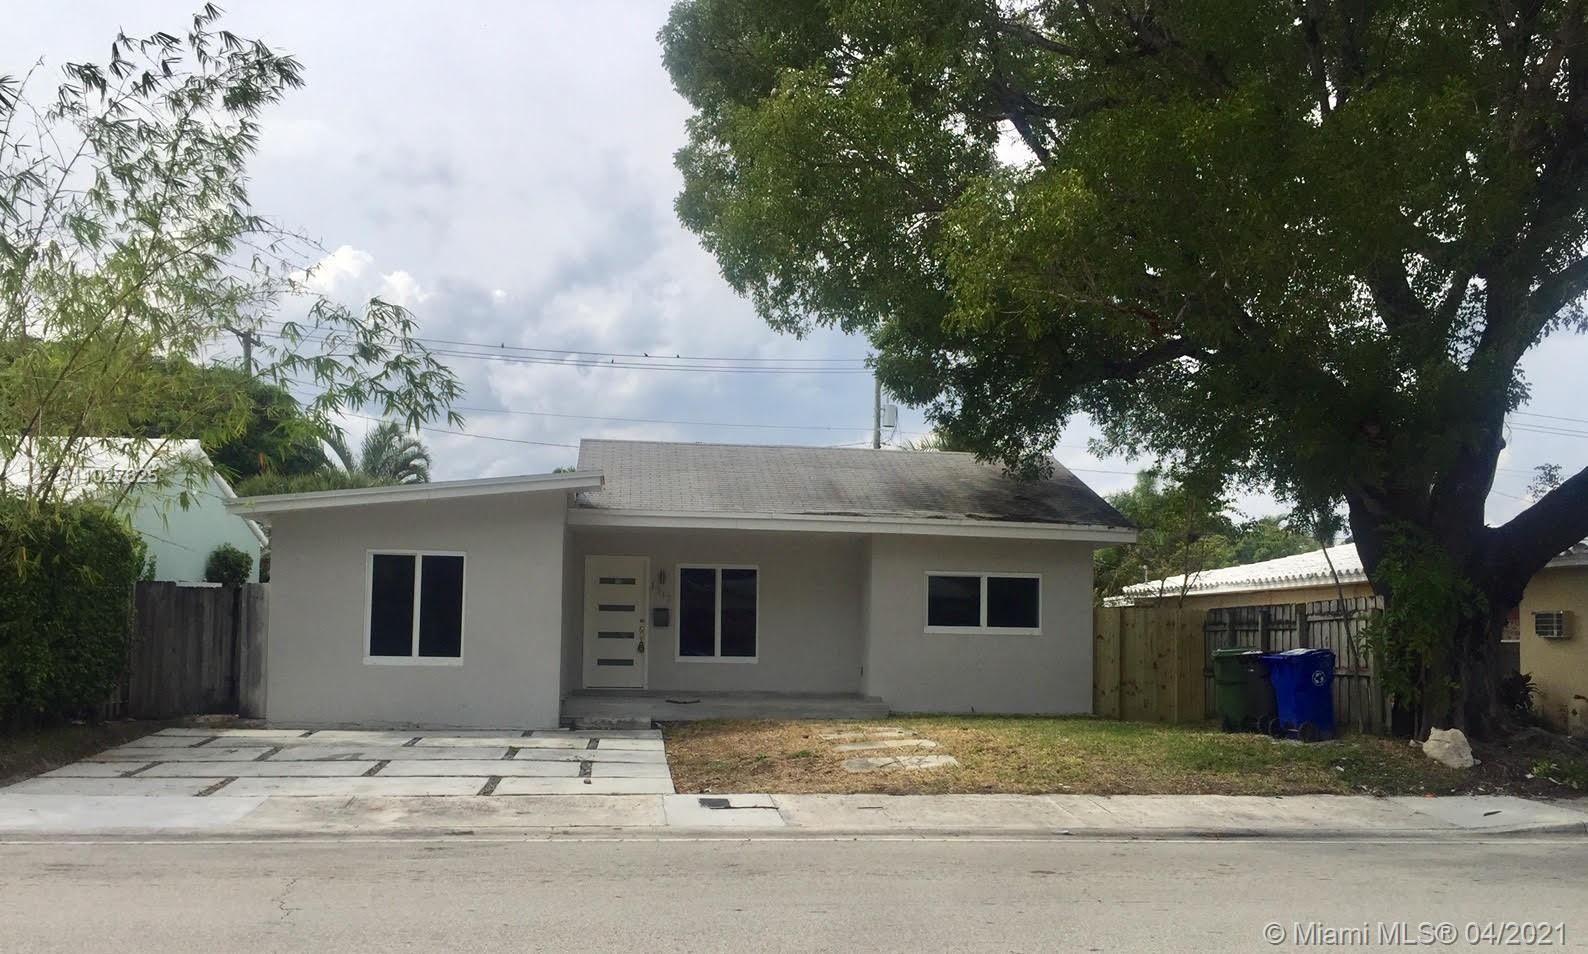 1313 NE 15th Ave, Fort Lauderdale, FL 33304 - #: A11027625